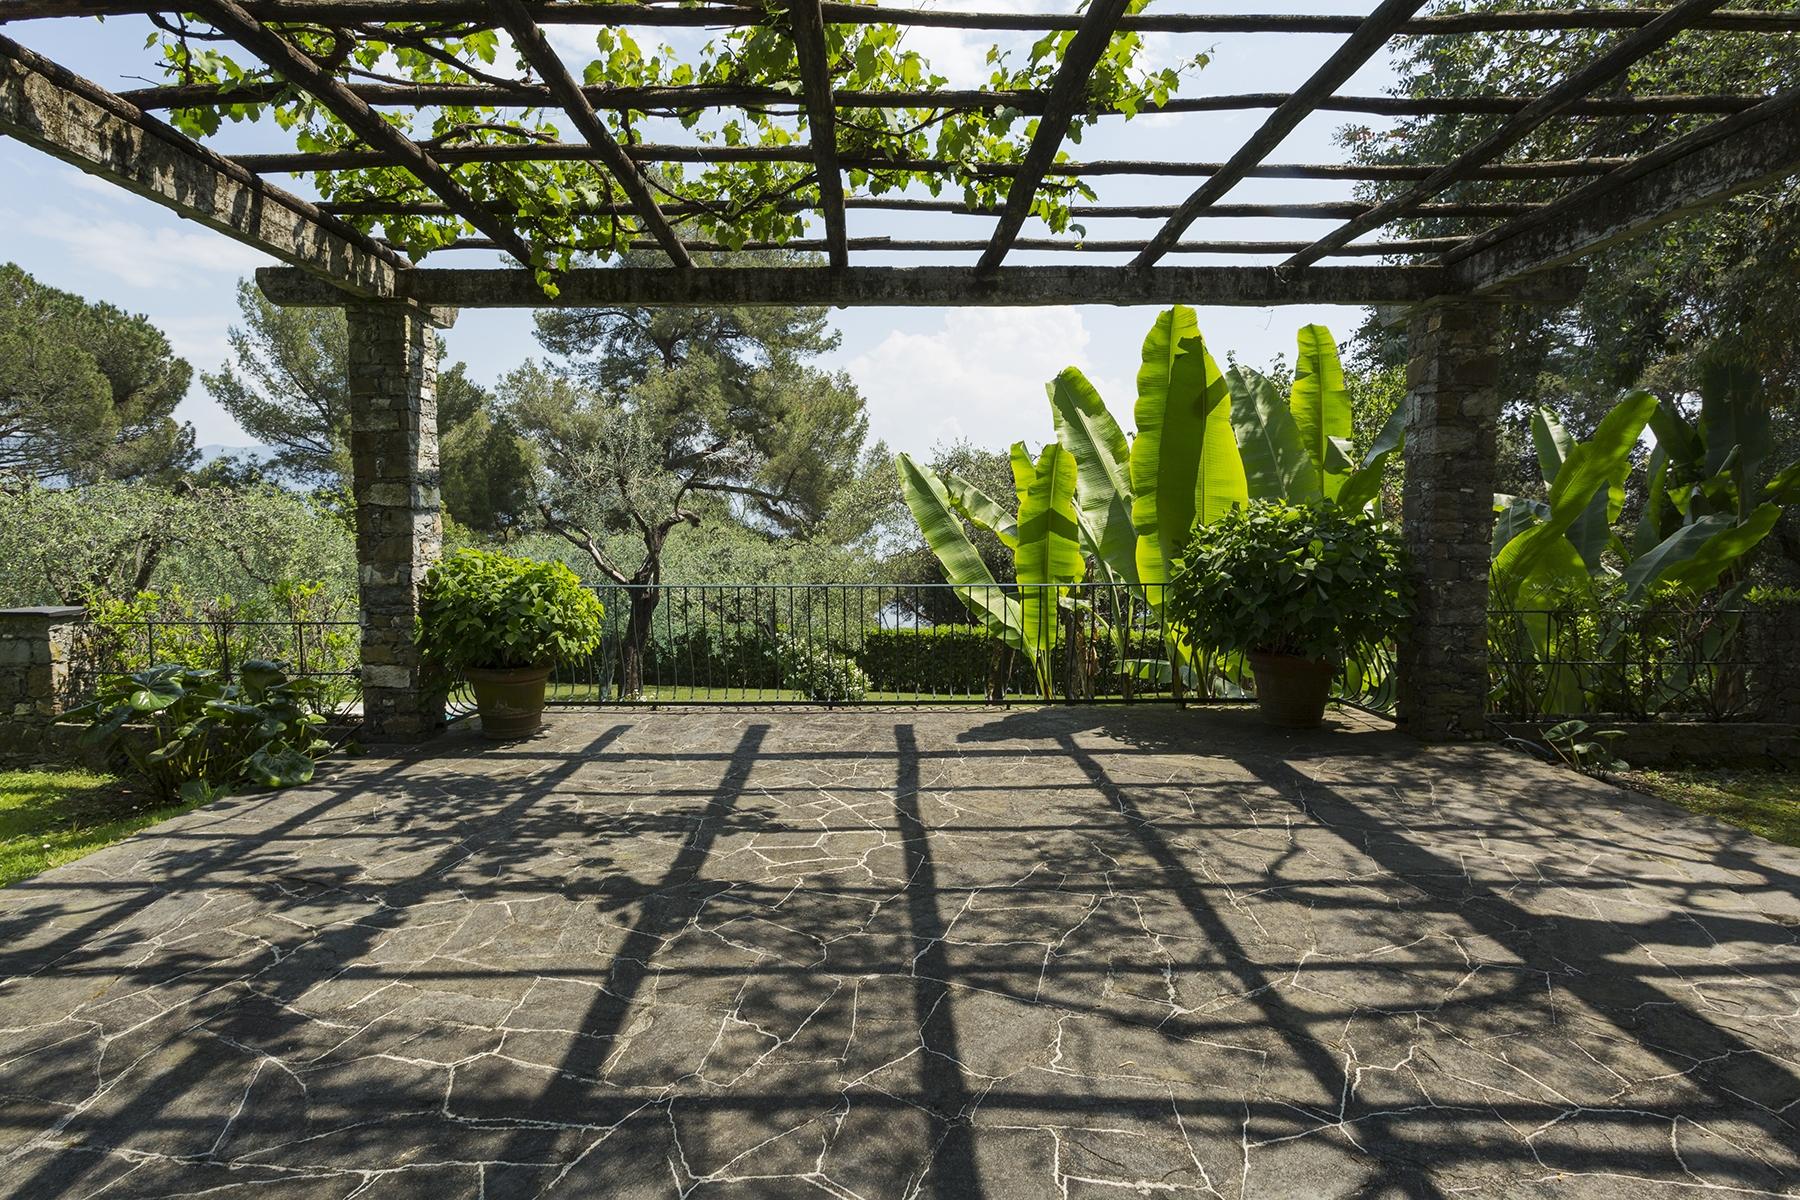 Villa in Vendita a Santa Margherita Ligure: 5 locali, 580 mq - Foto 29